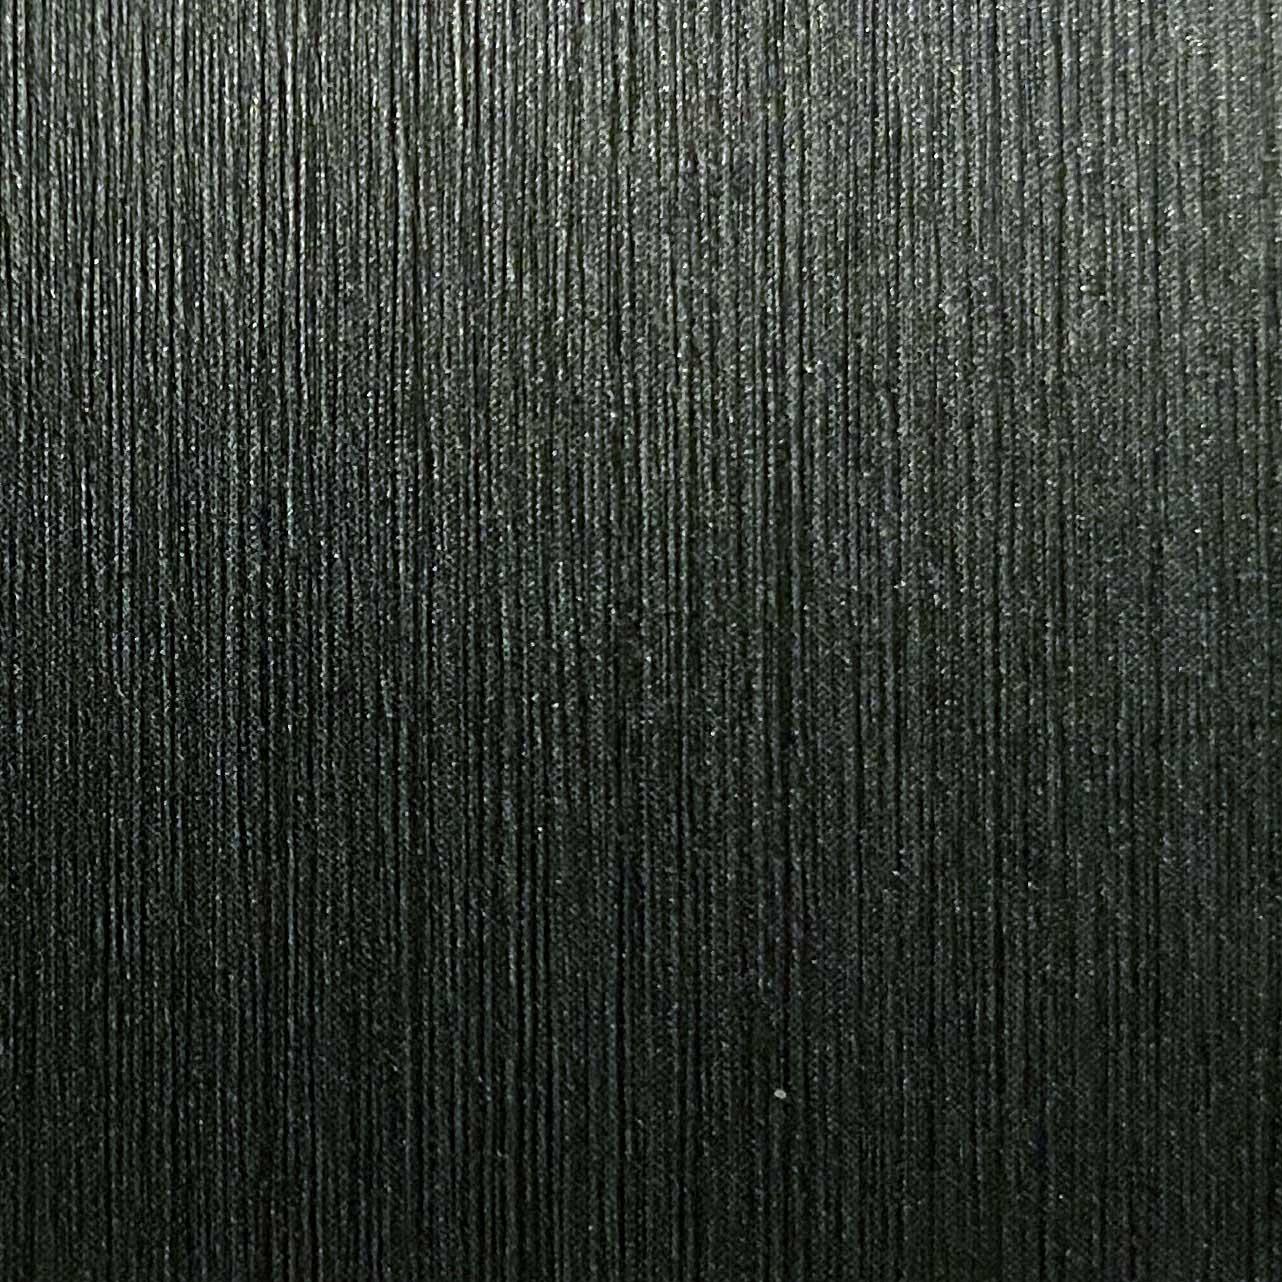 NE49 Soft Brushed Dark Silver